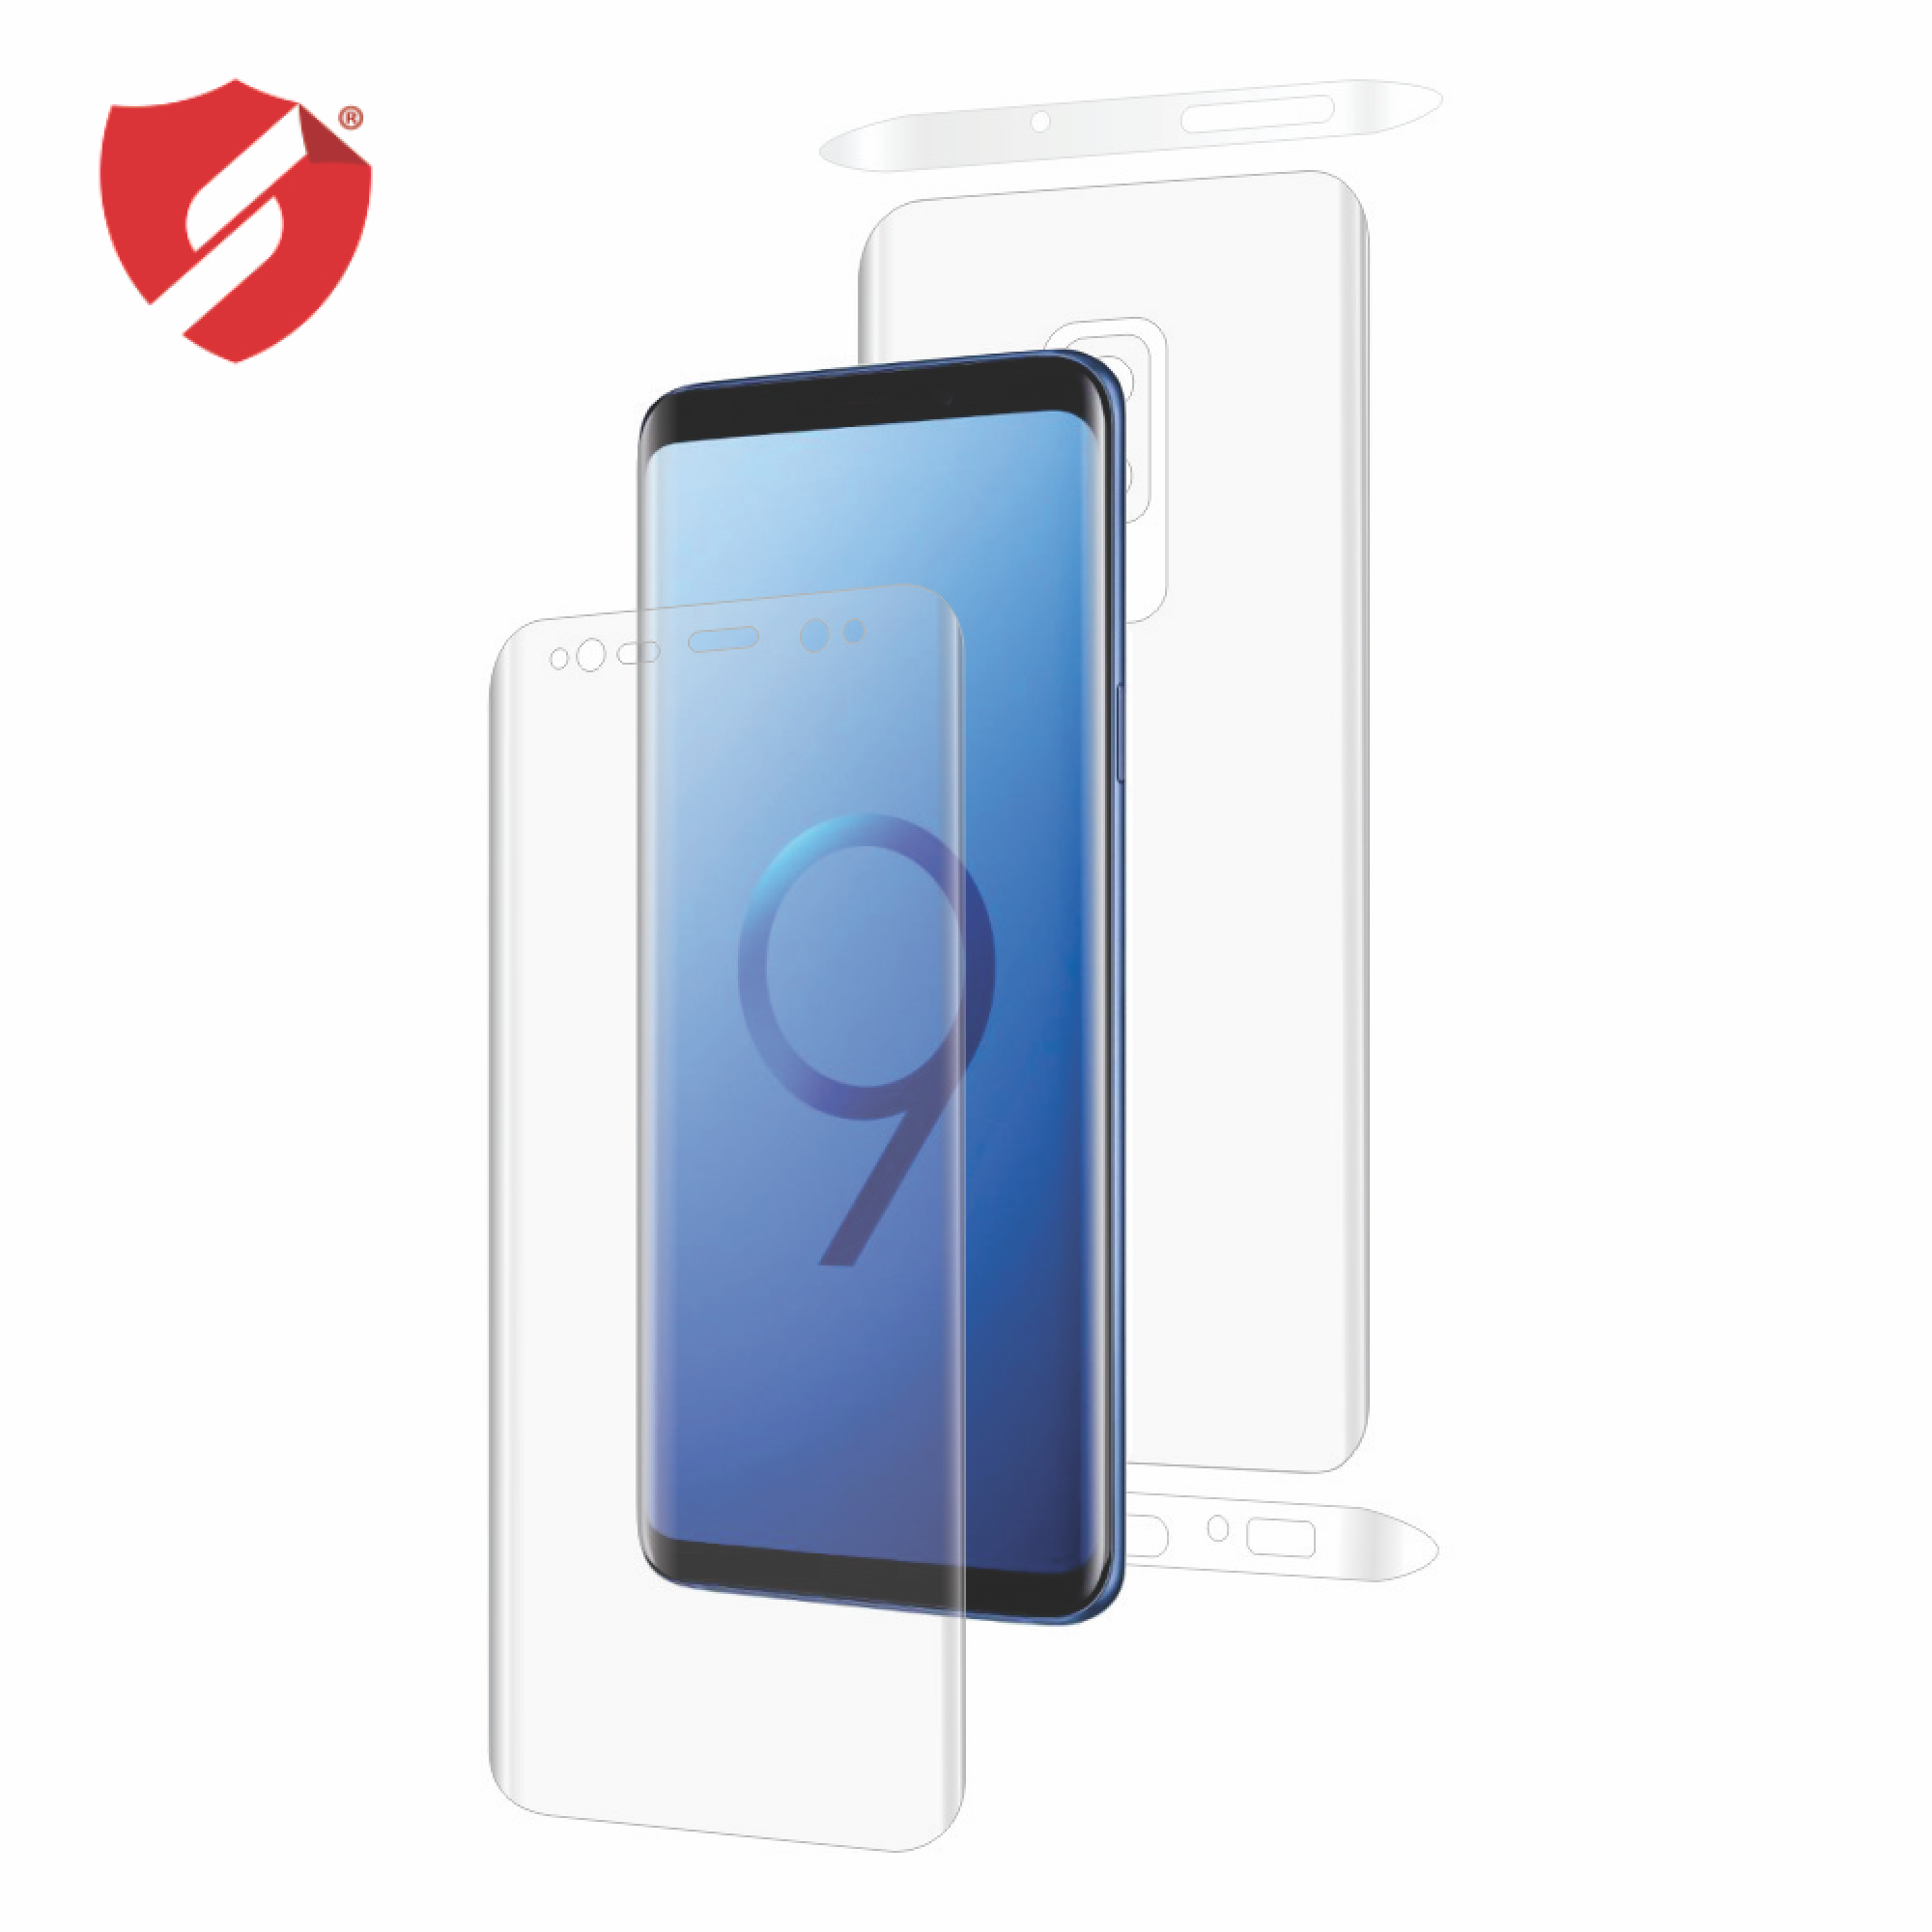 Folie de protectie Smart Protection Samsung Galaxy S9 Plus compatibila cu carcasa Spigen - fullbody - display + spate + laterale imagine